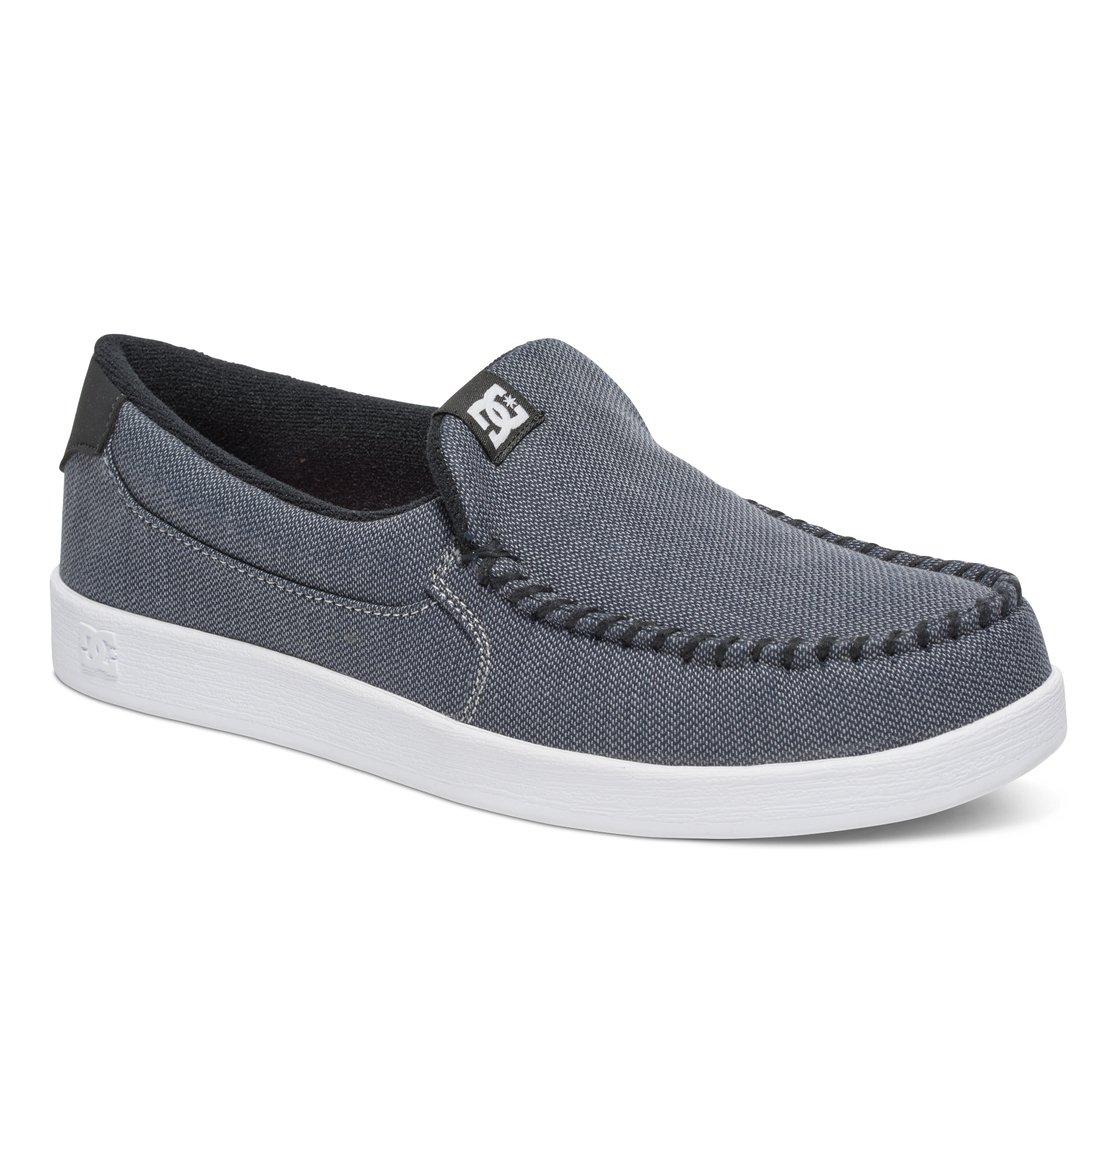 Dc Slip On Villain Shoes